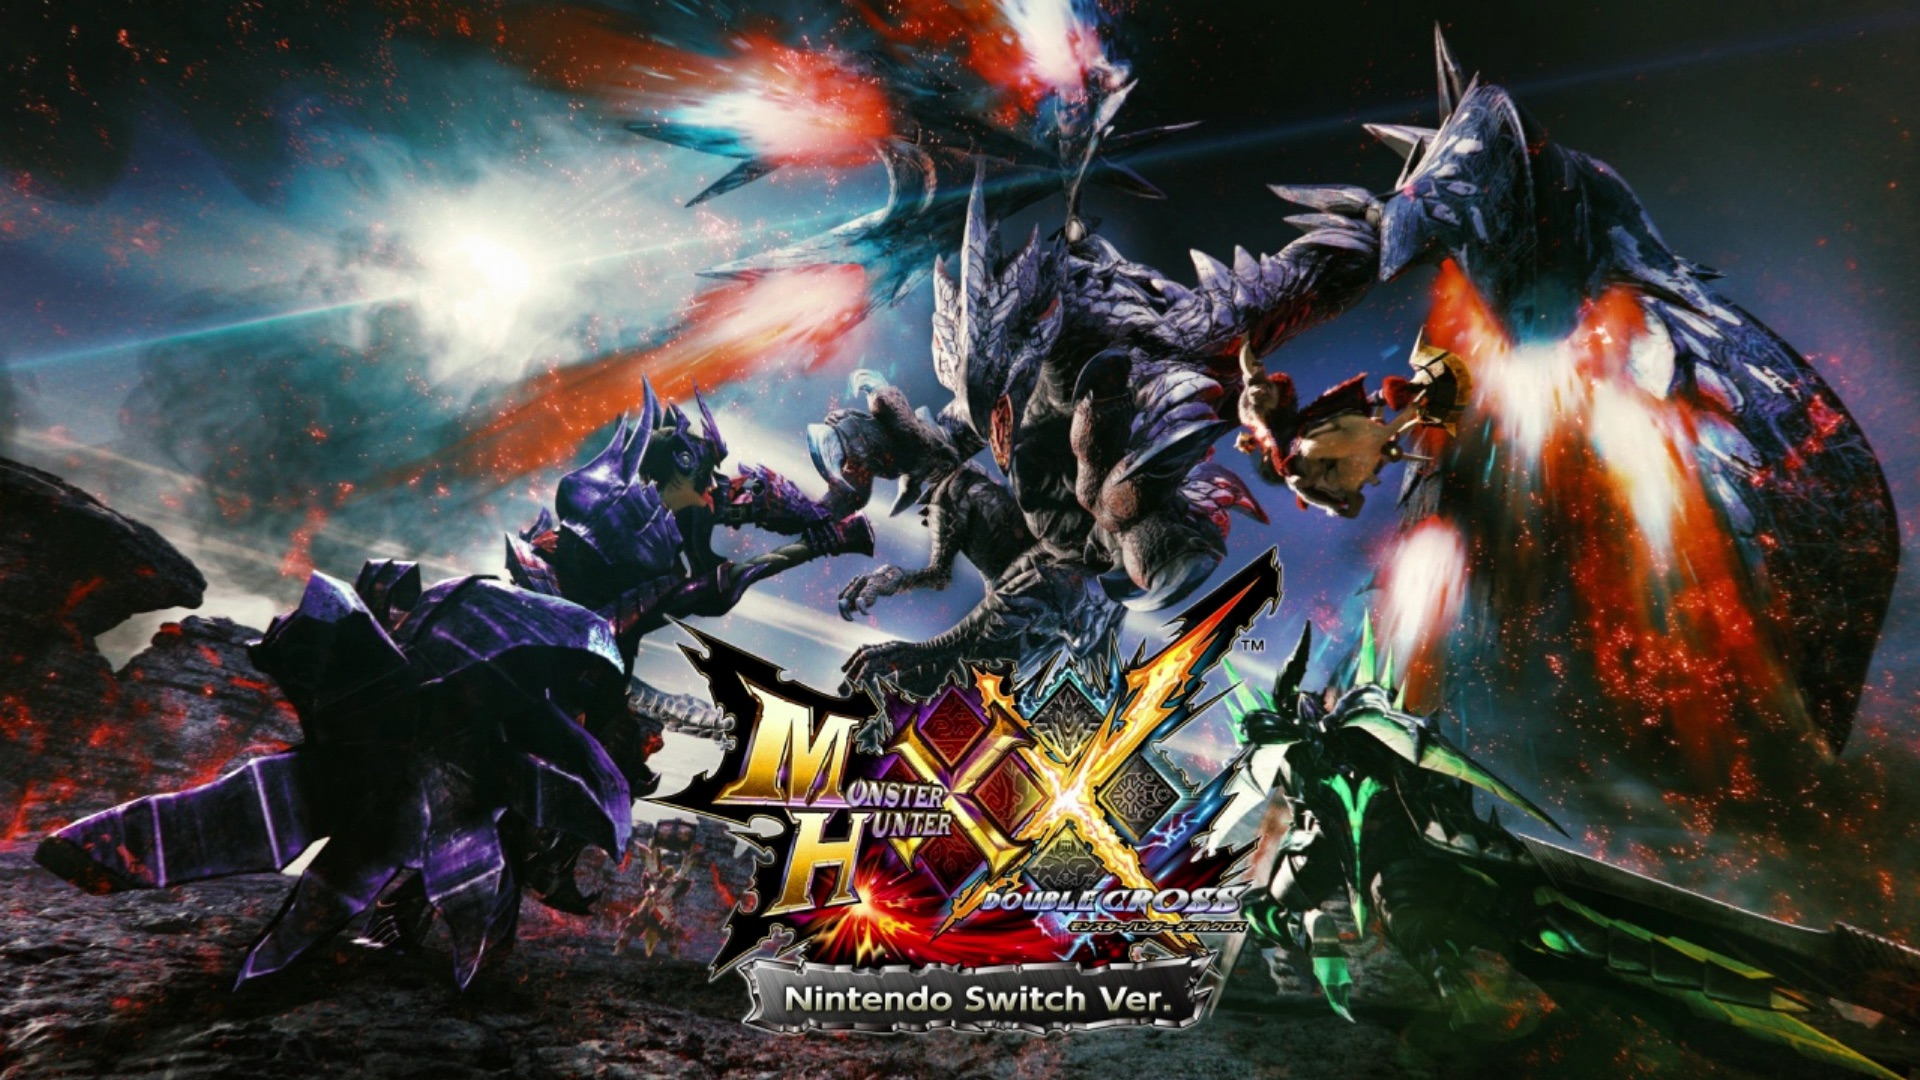 monster-hunter-xx-nintendo-switch-screenshot-1